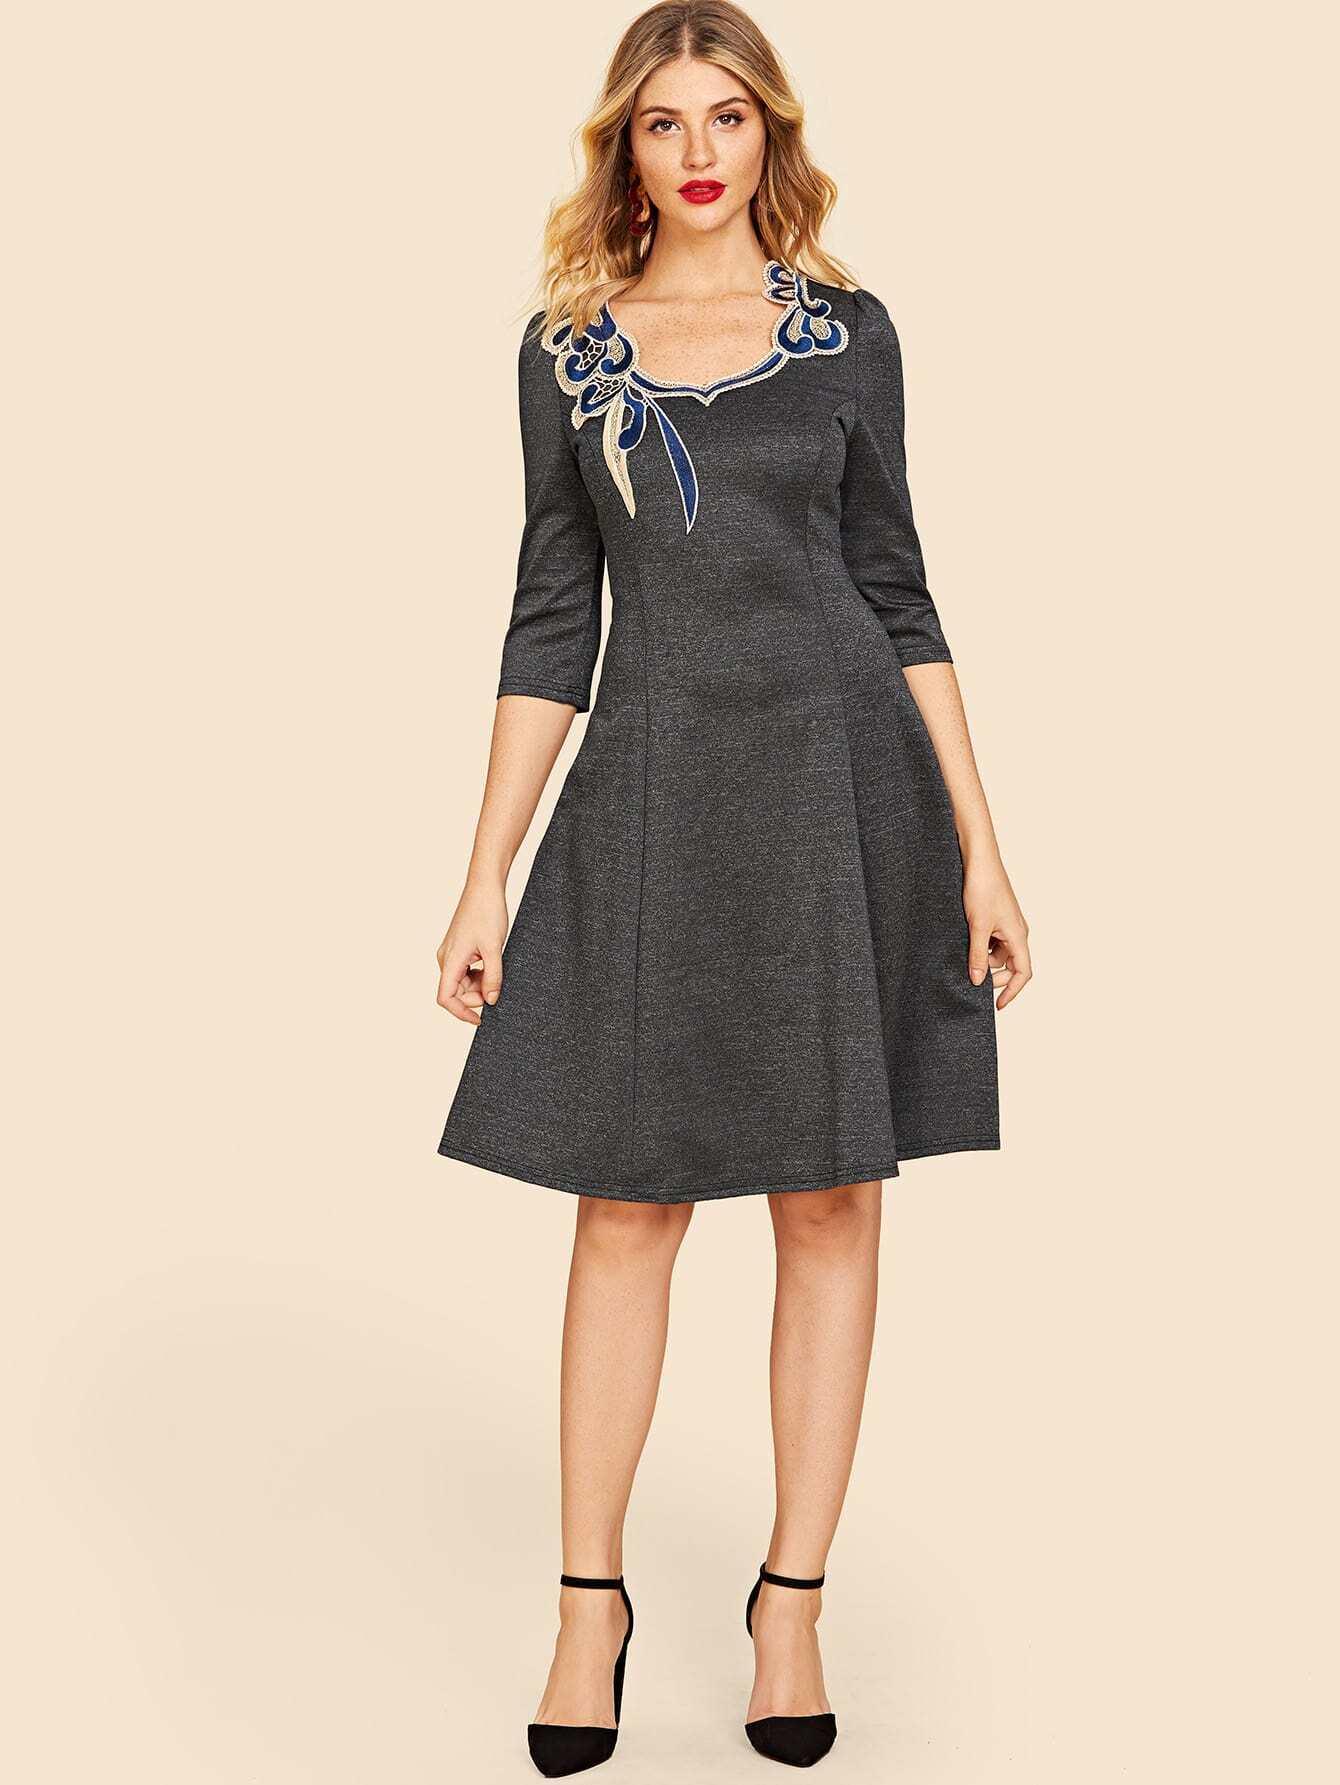 50s Appliques Zip Back Dress 50s Appliques Zip Back Dress